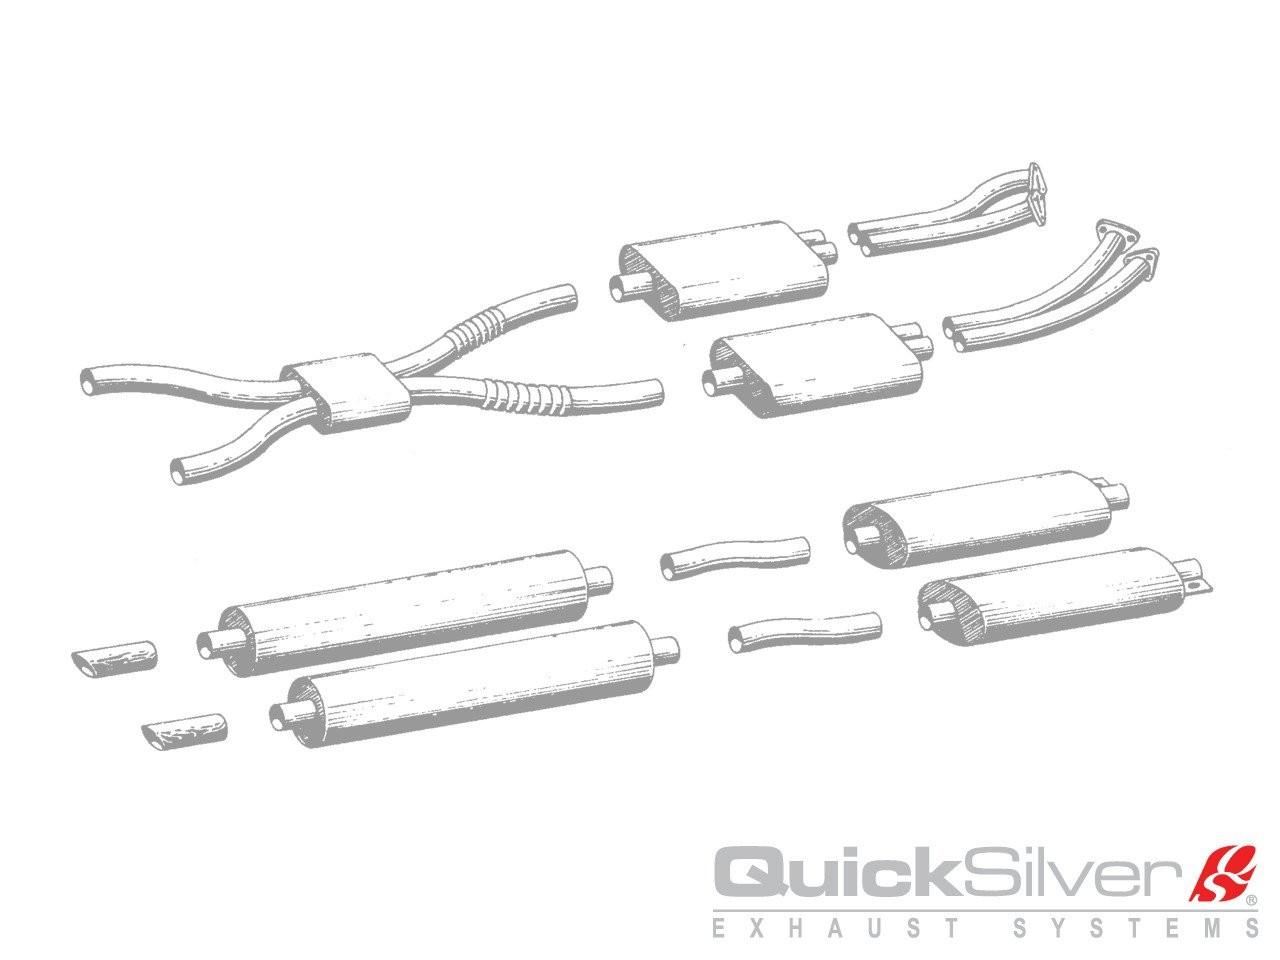 QuickSilver Exhausts Heritage | Aston Martin DBS - V8, 1969-72, AS009 (Výfukový systém – nerezová ocel)